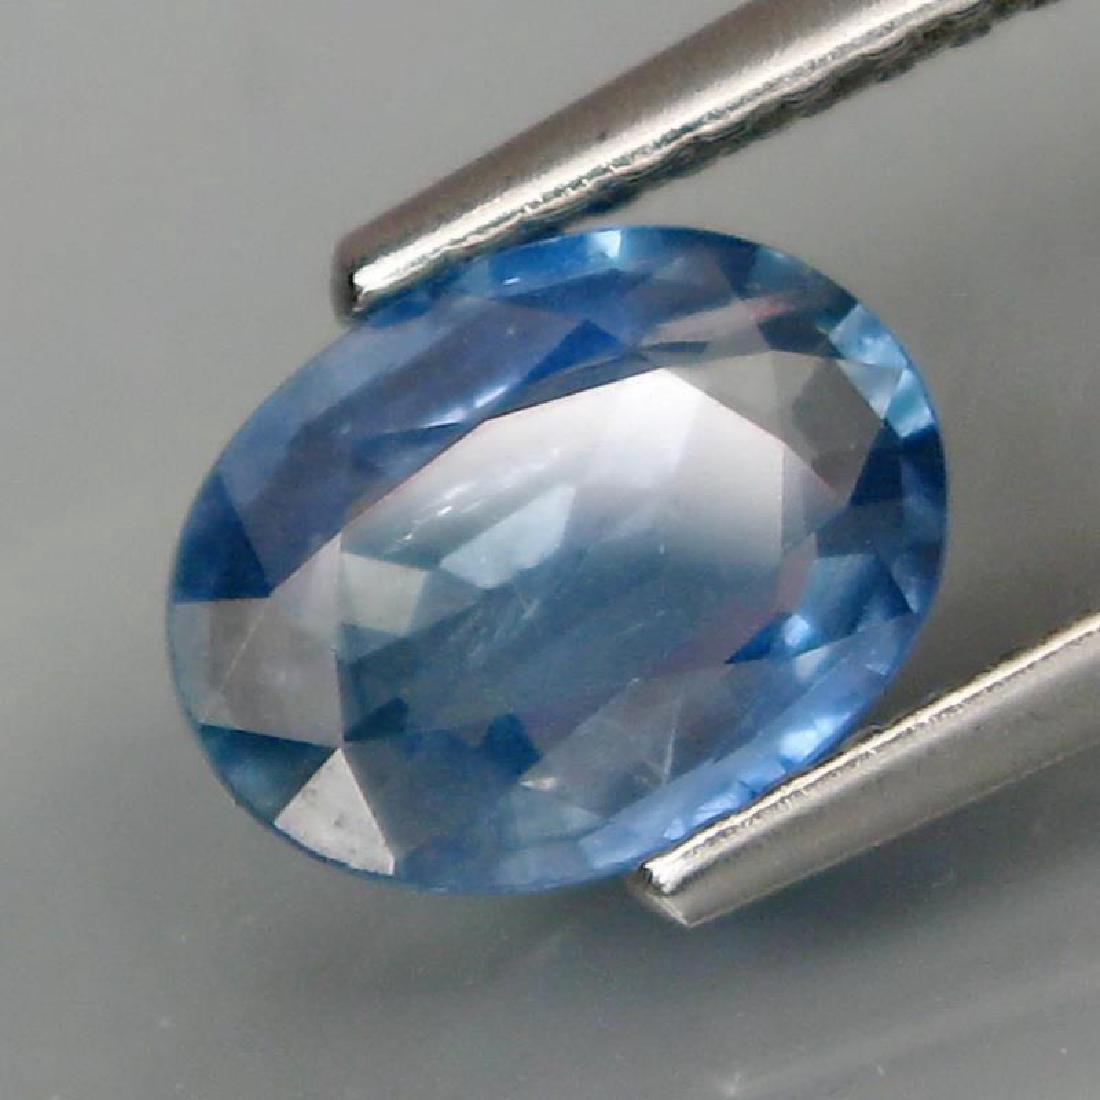 1.22 Carat Genuine Loose Sapphire